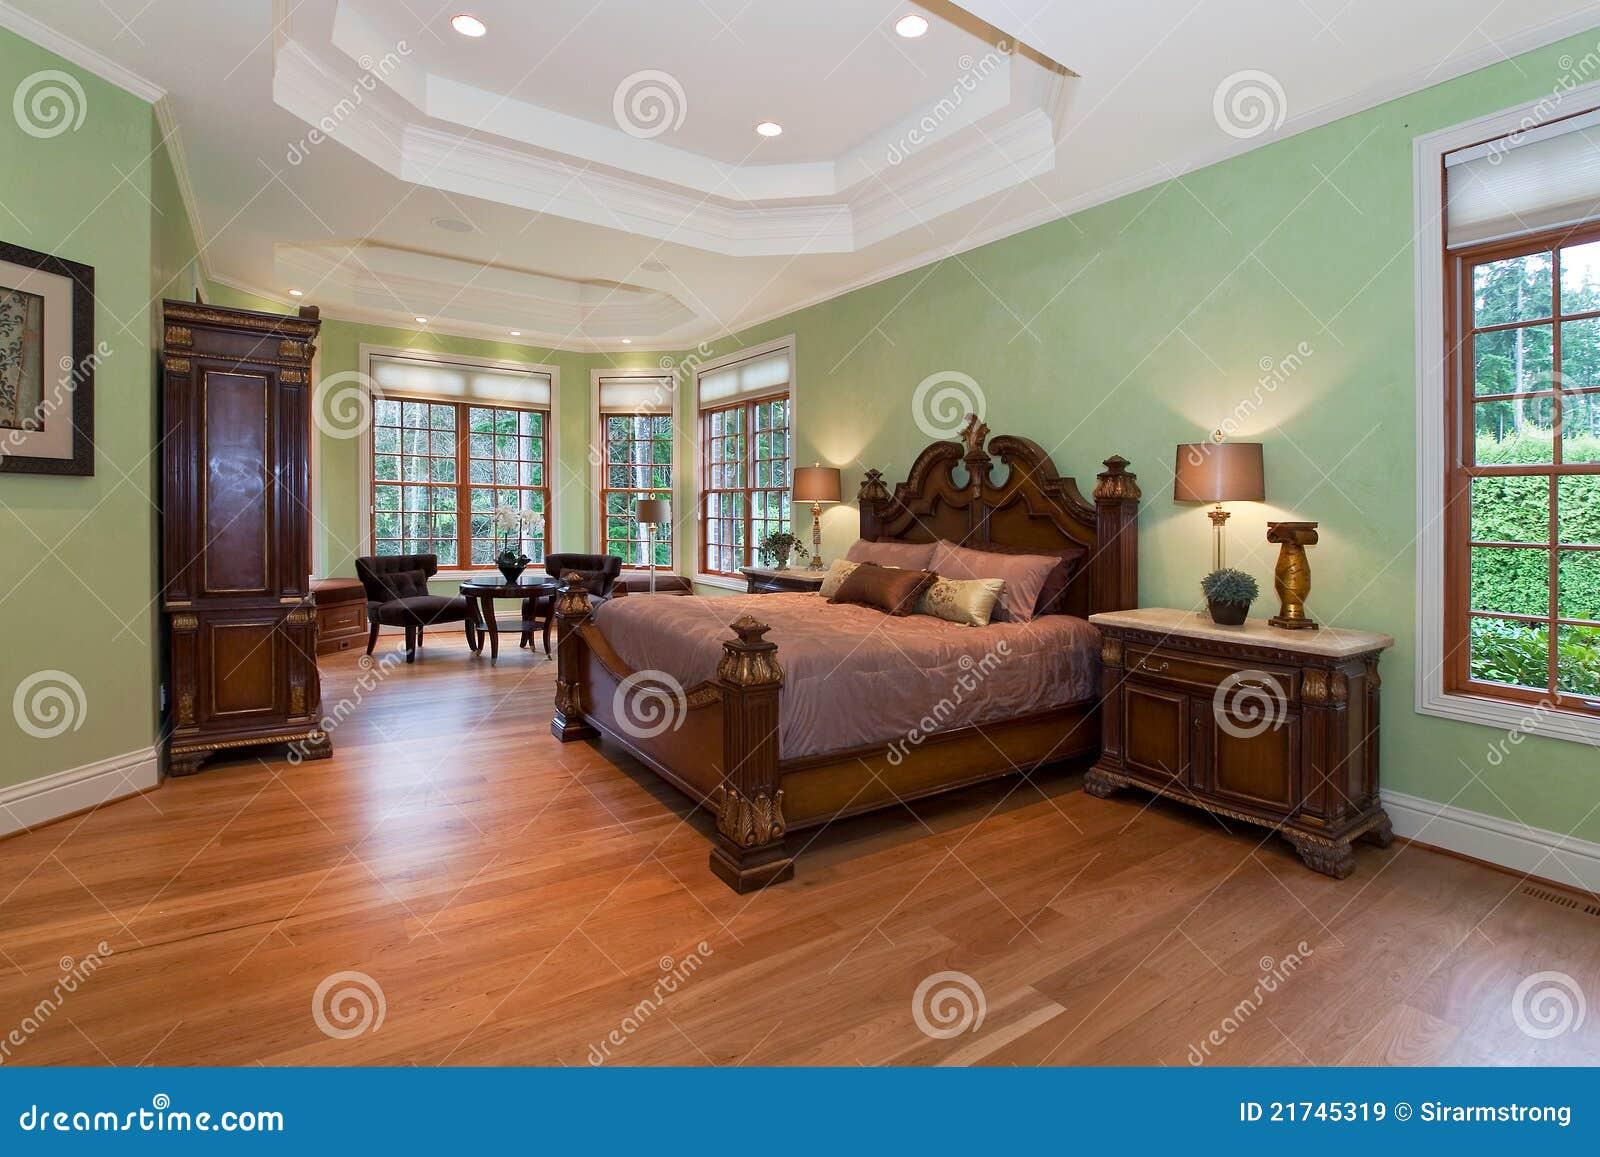 Modern Master Bedroom Royalty Free Stock Image